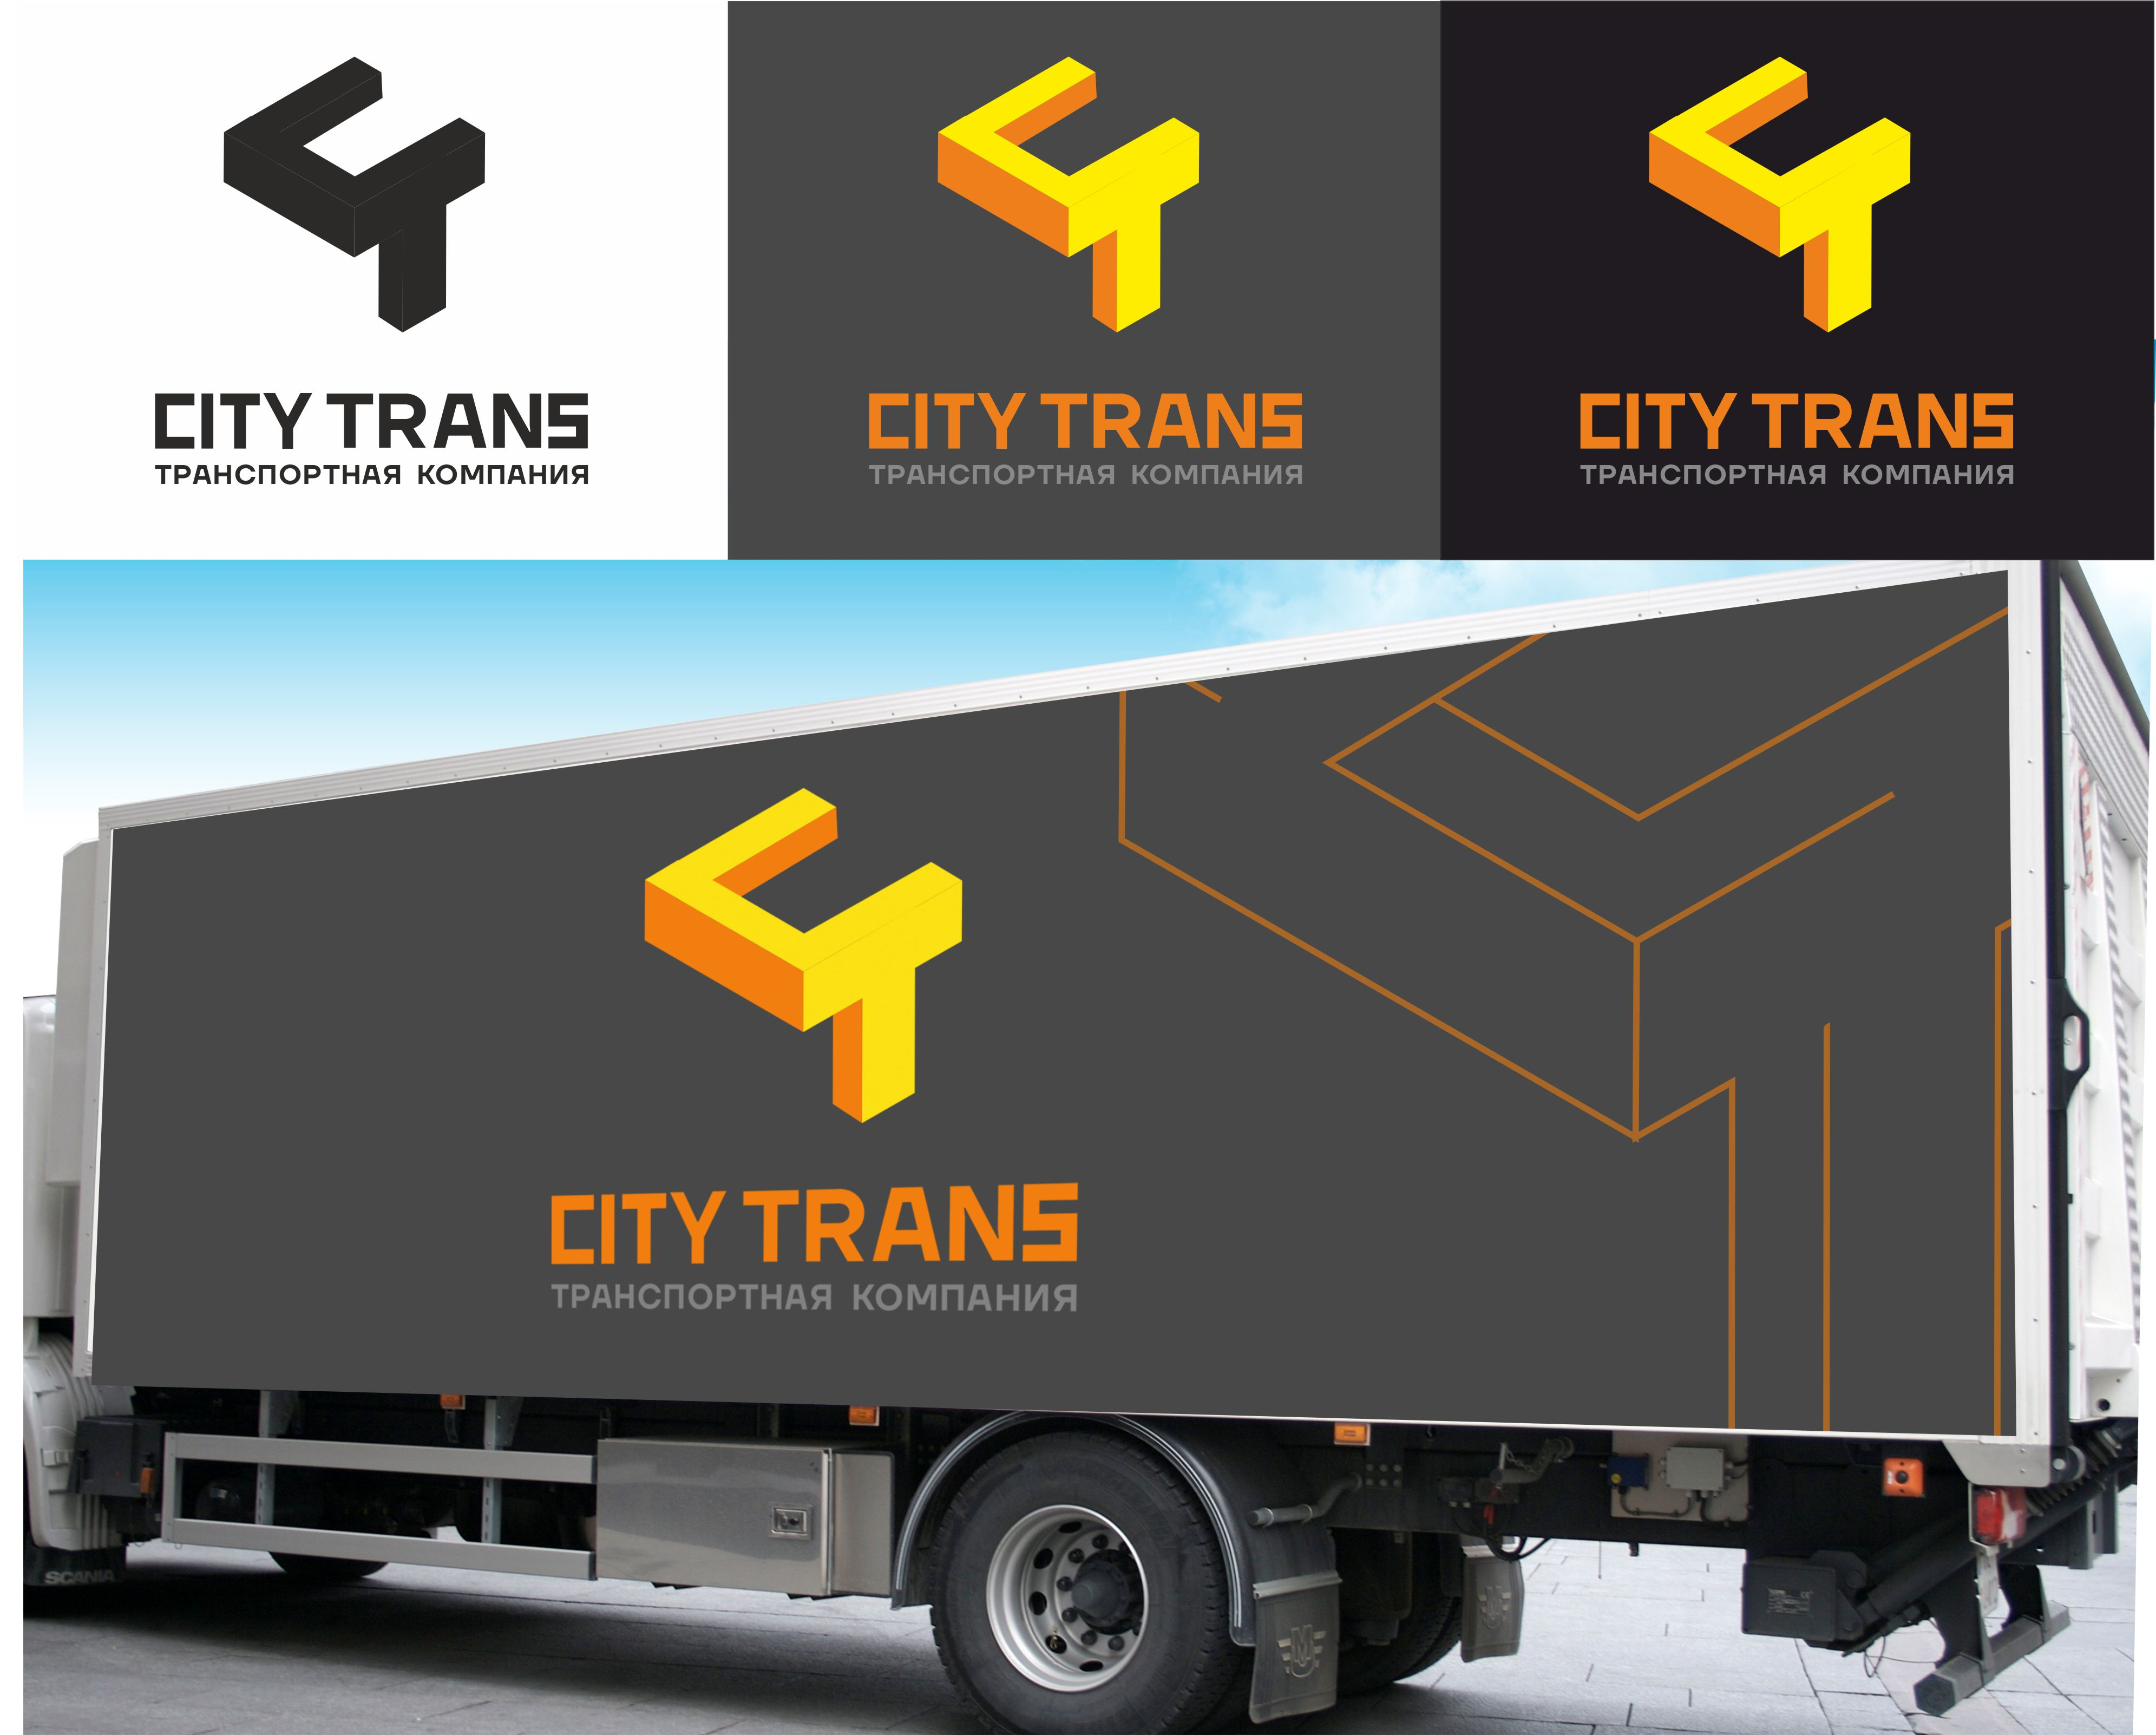 Разработка Логотипа транспортной компании фото f_6965e75c8846fafa.jpg